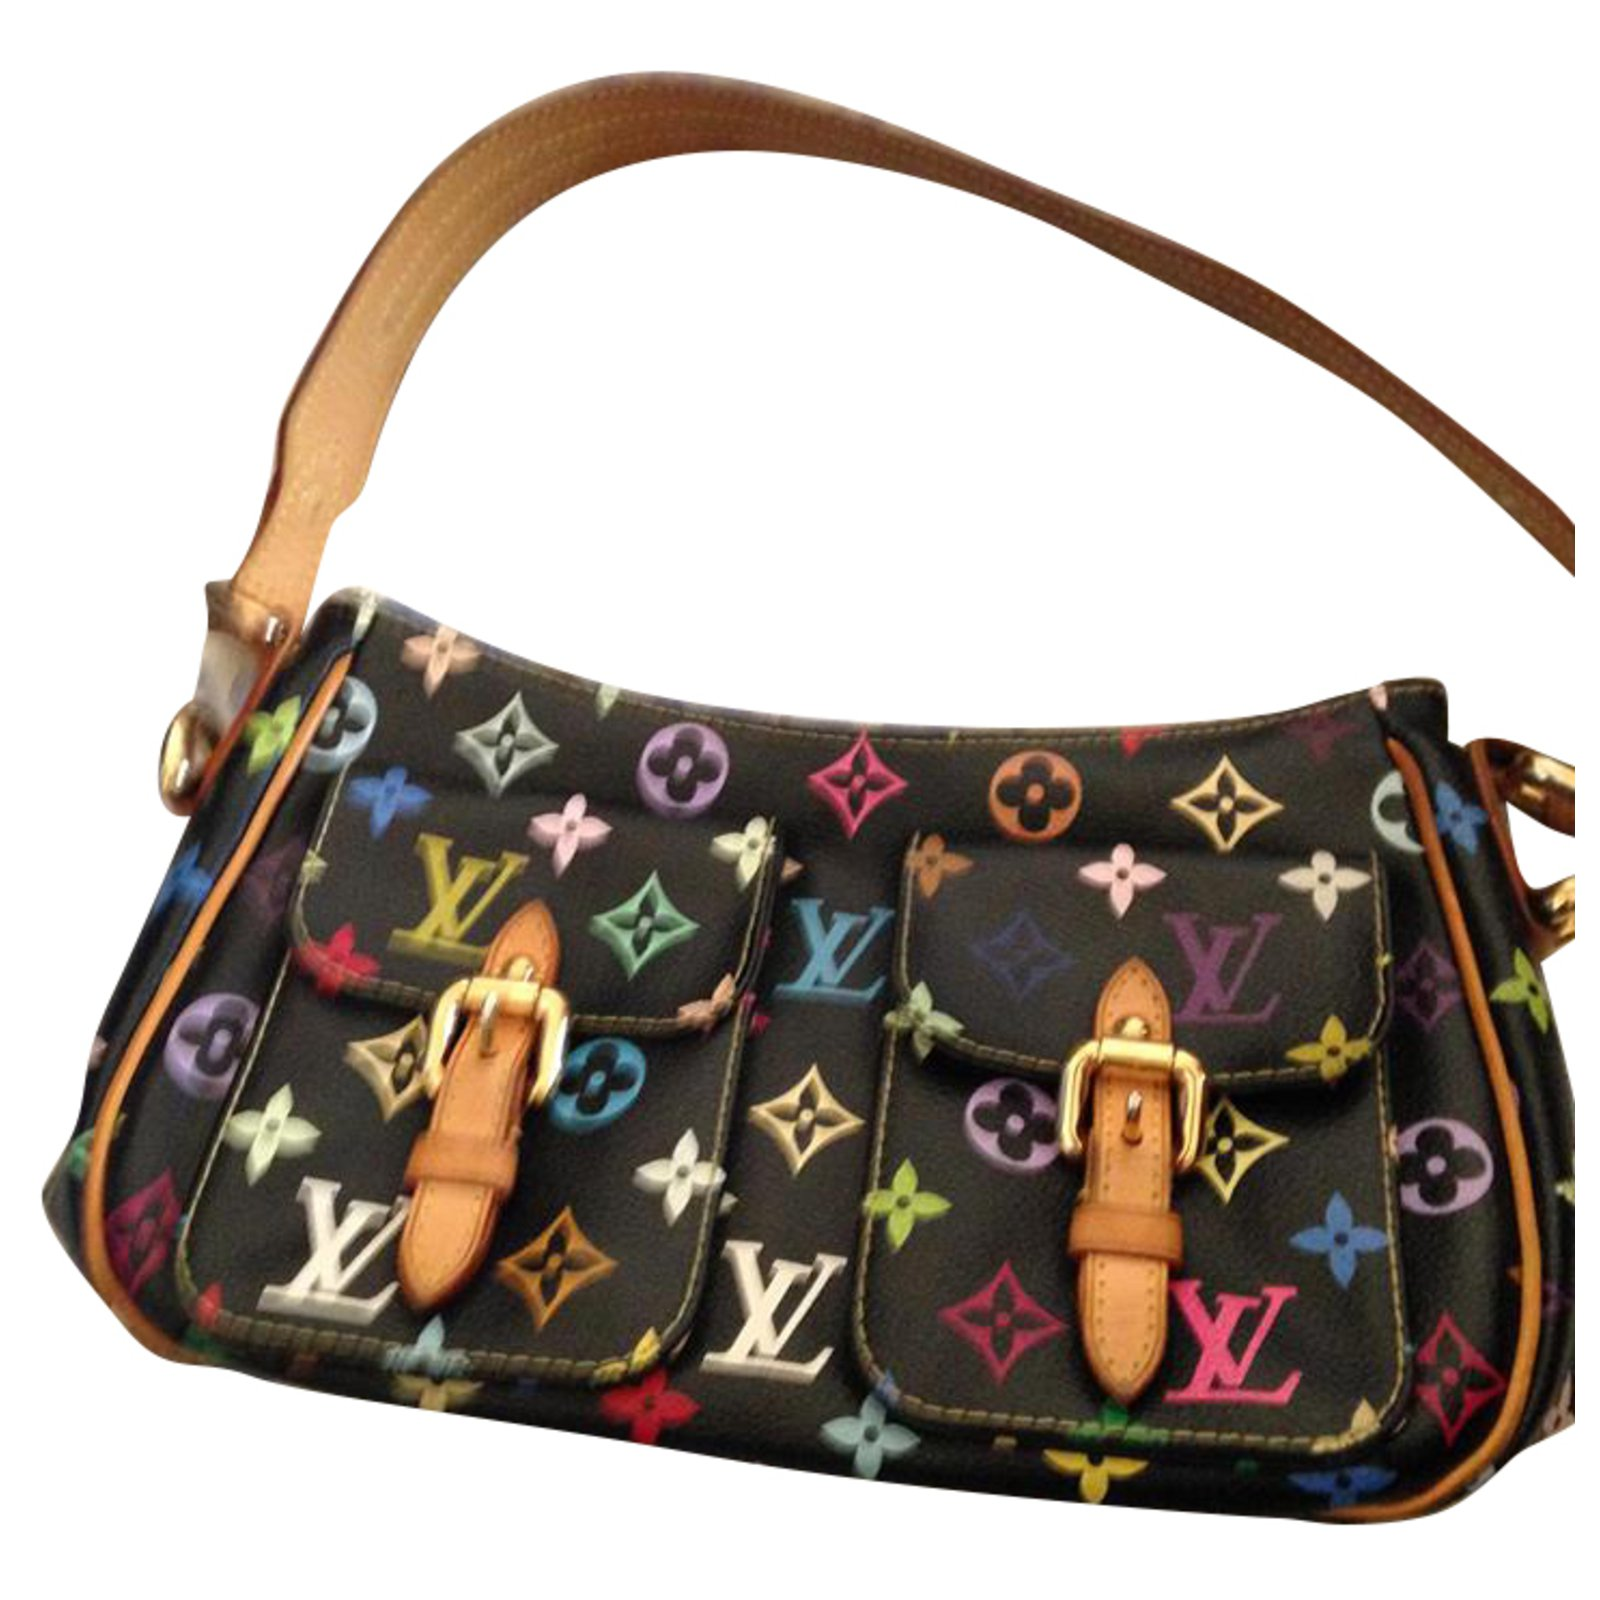 c9e475ce8361 Louis Vuitton Handbags Handbags Leather Black ref.67675 - Joli Closet